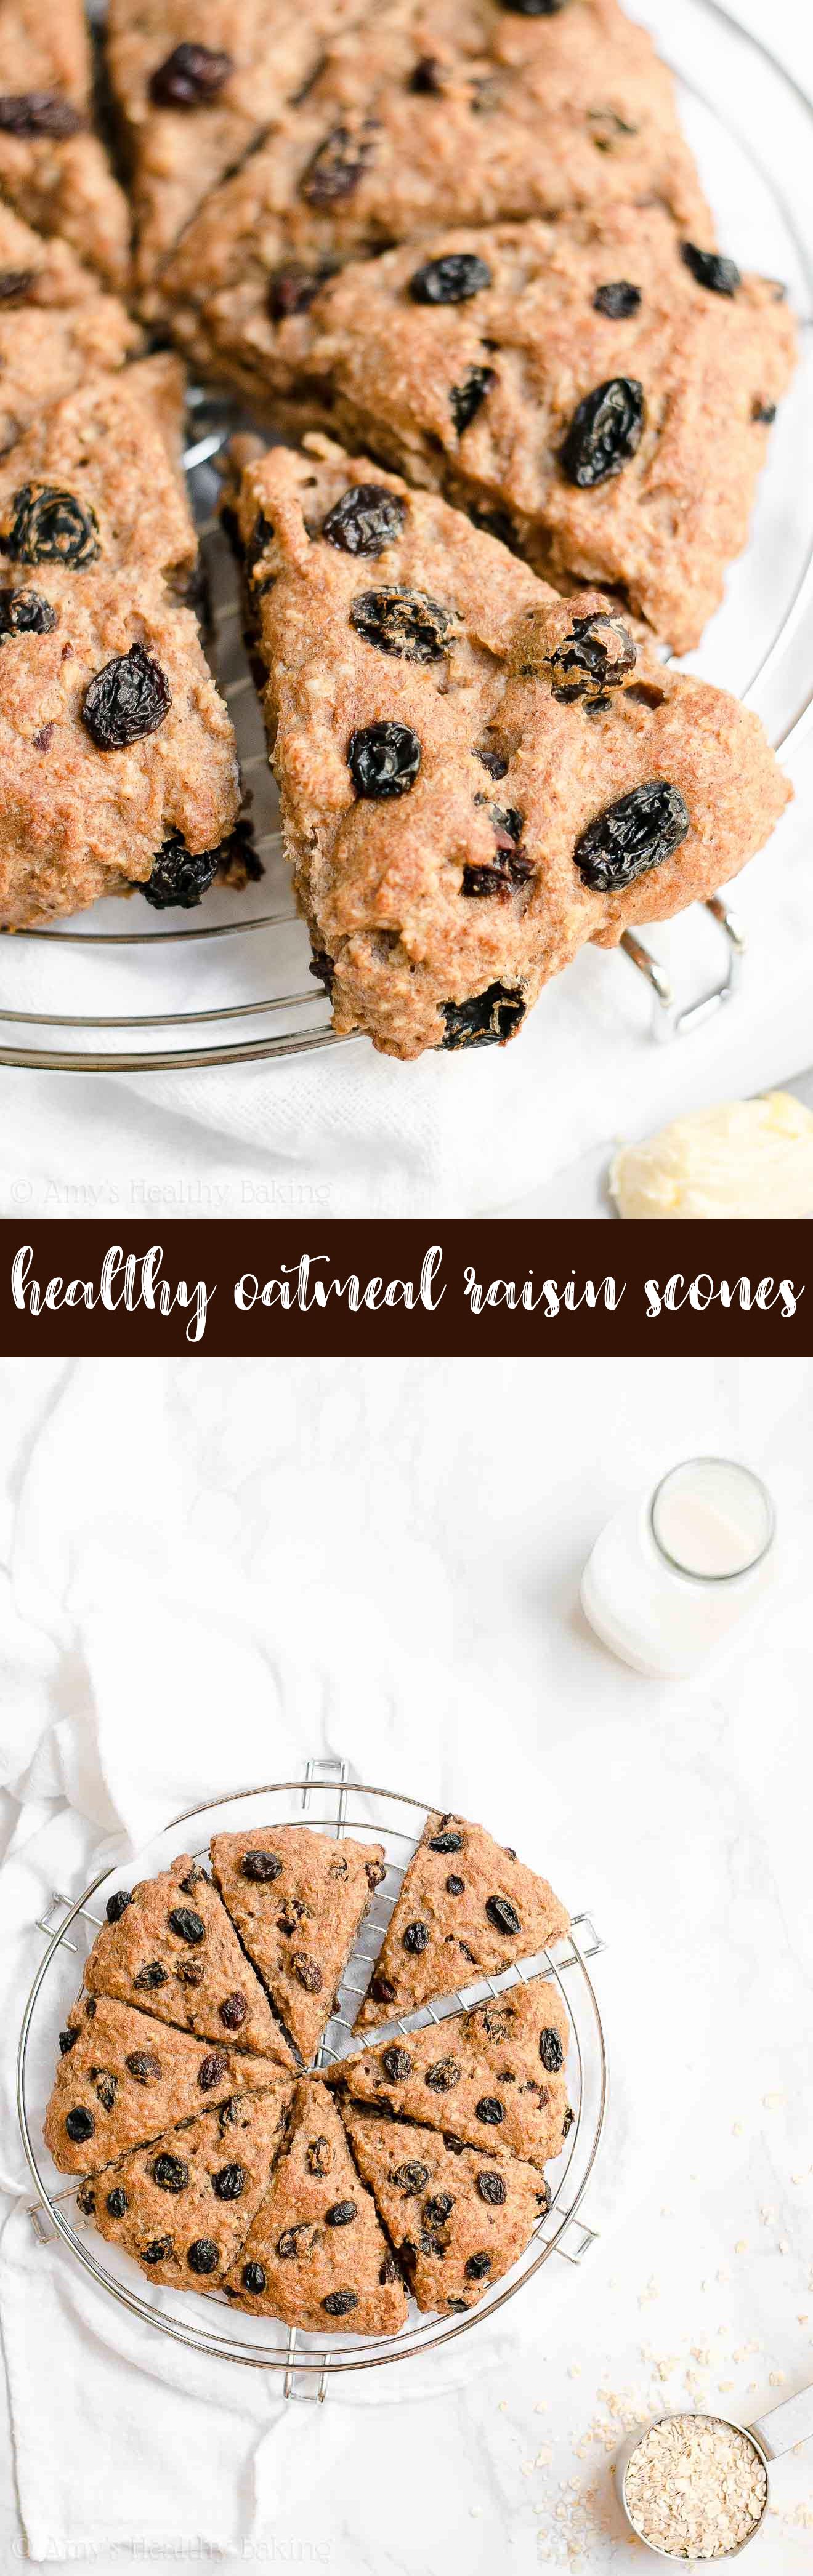 Best Ever Healthy Oatmeal Raisin Scones